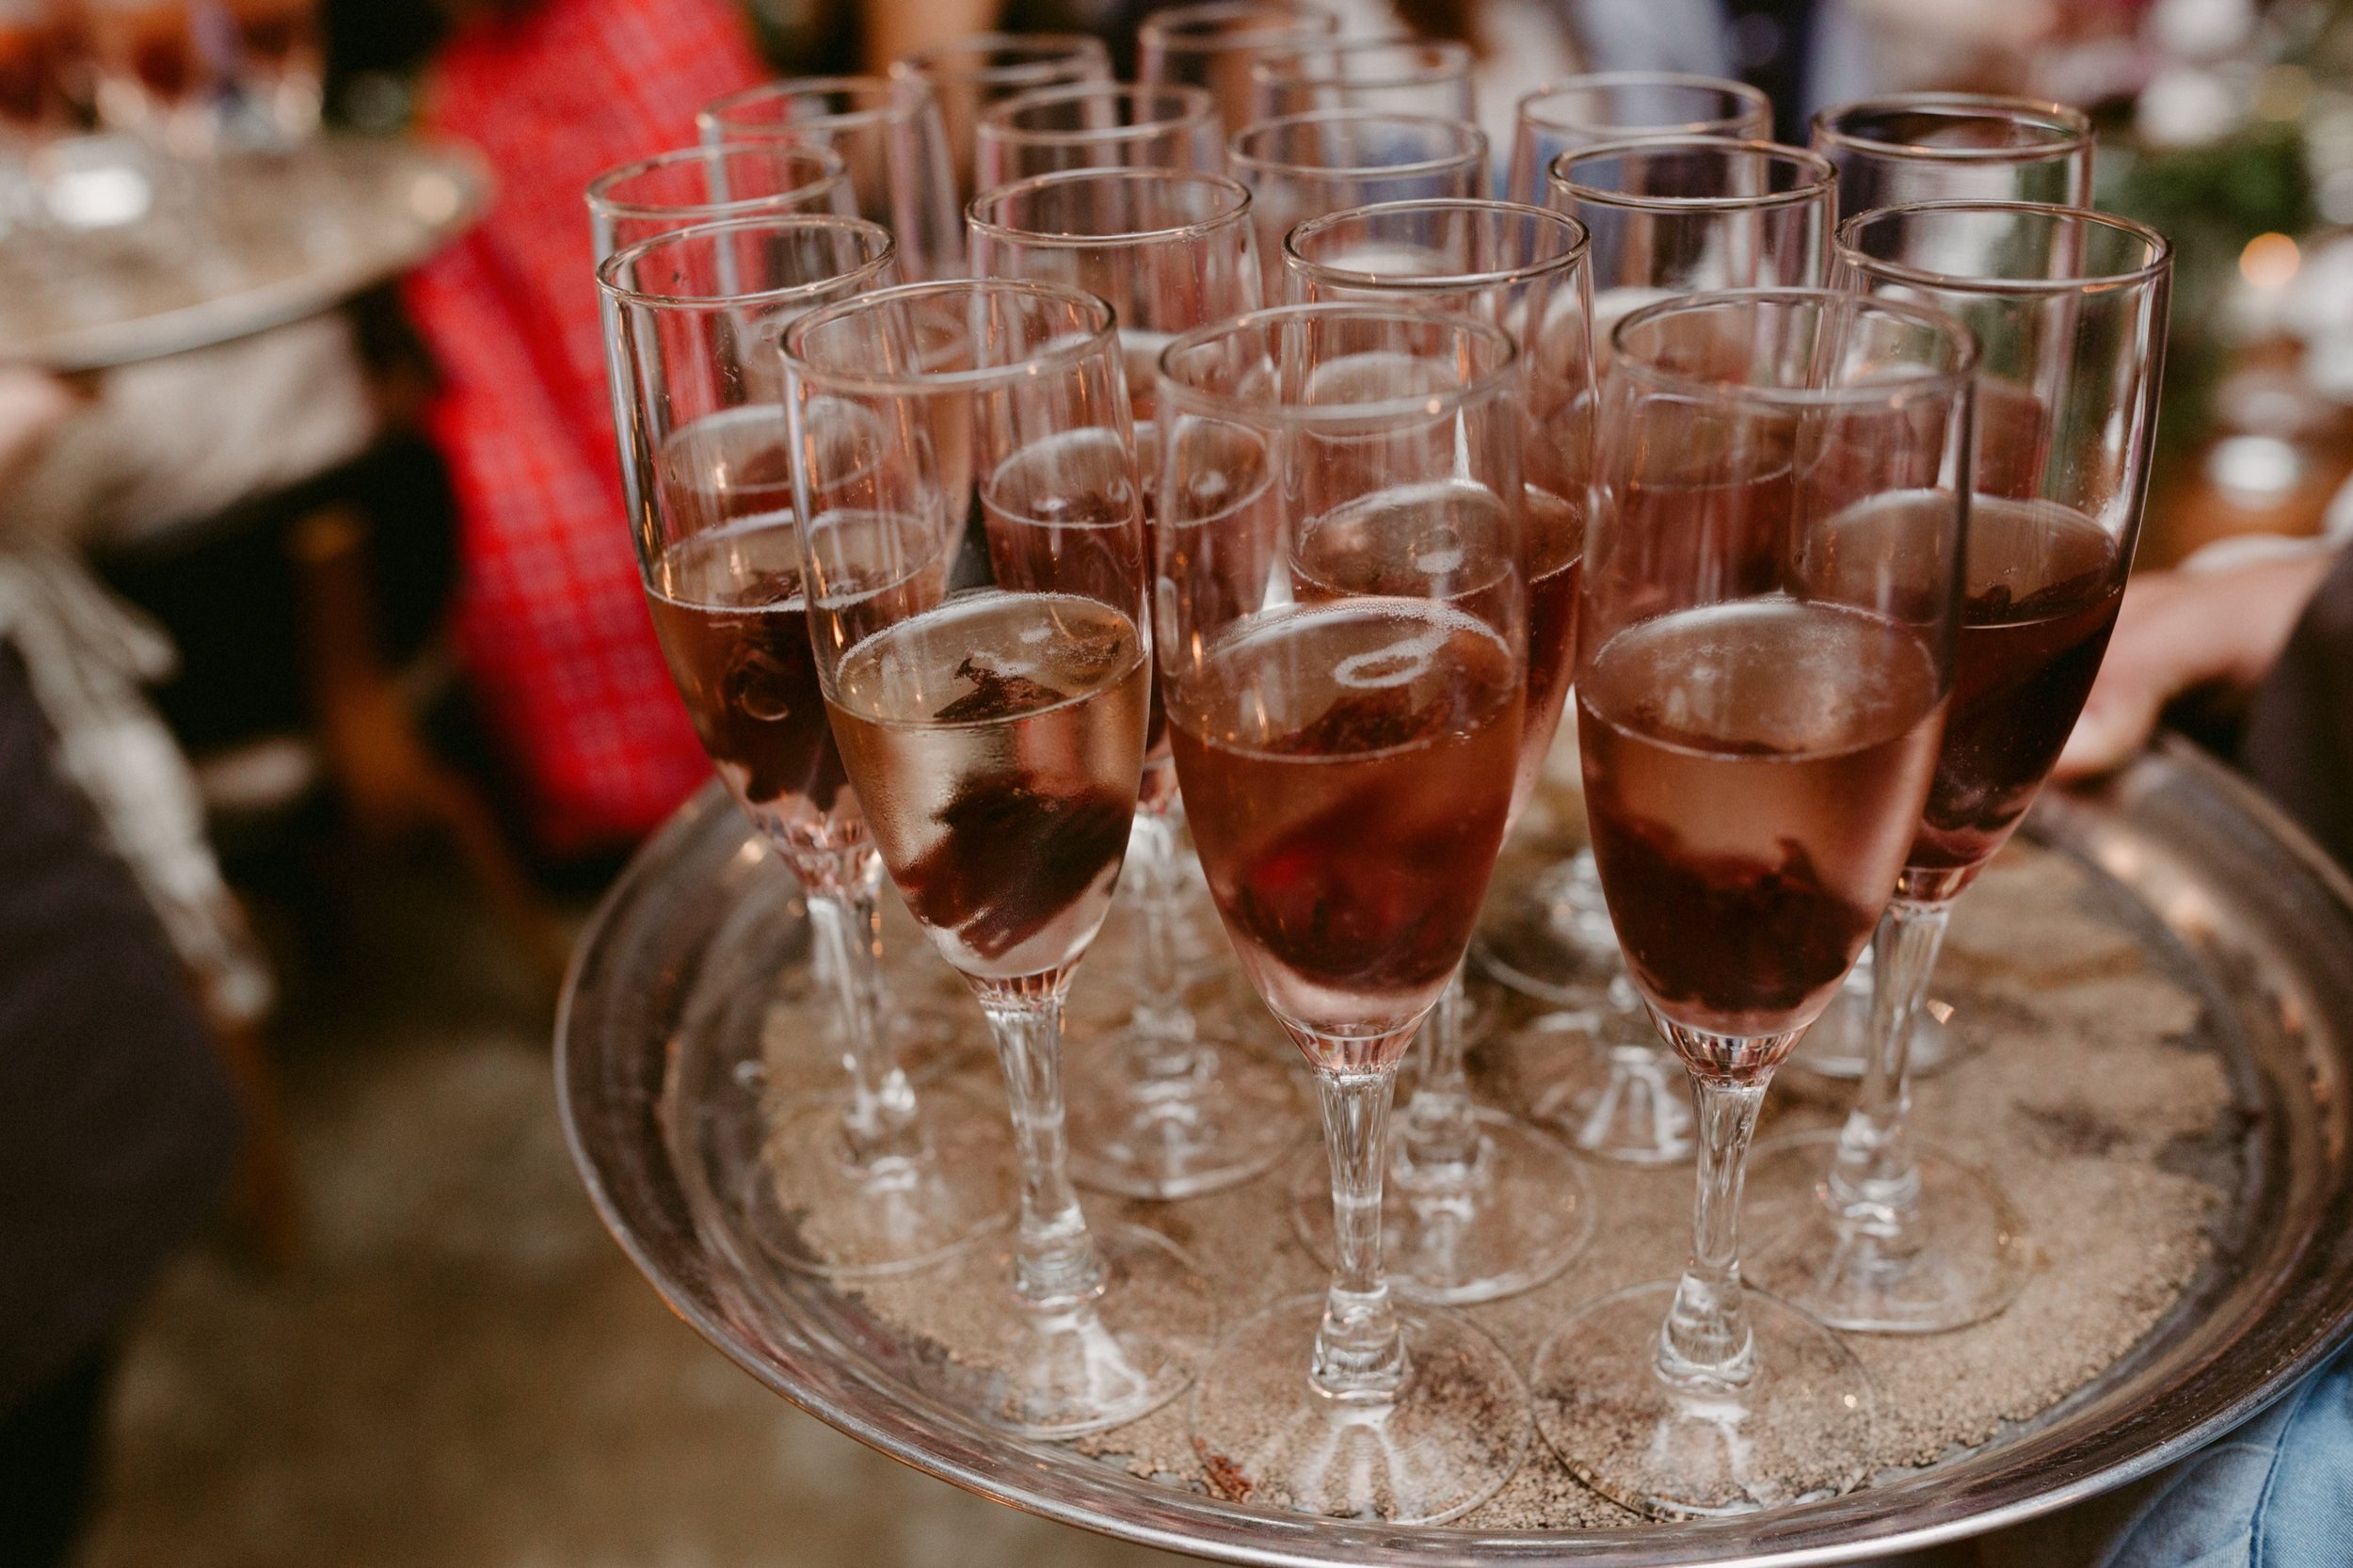 109_Spadina House Wedding (617 of 748)_intimate_Boehmer_Restaurant_Toronto_Wedding.jpg